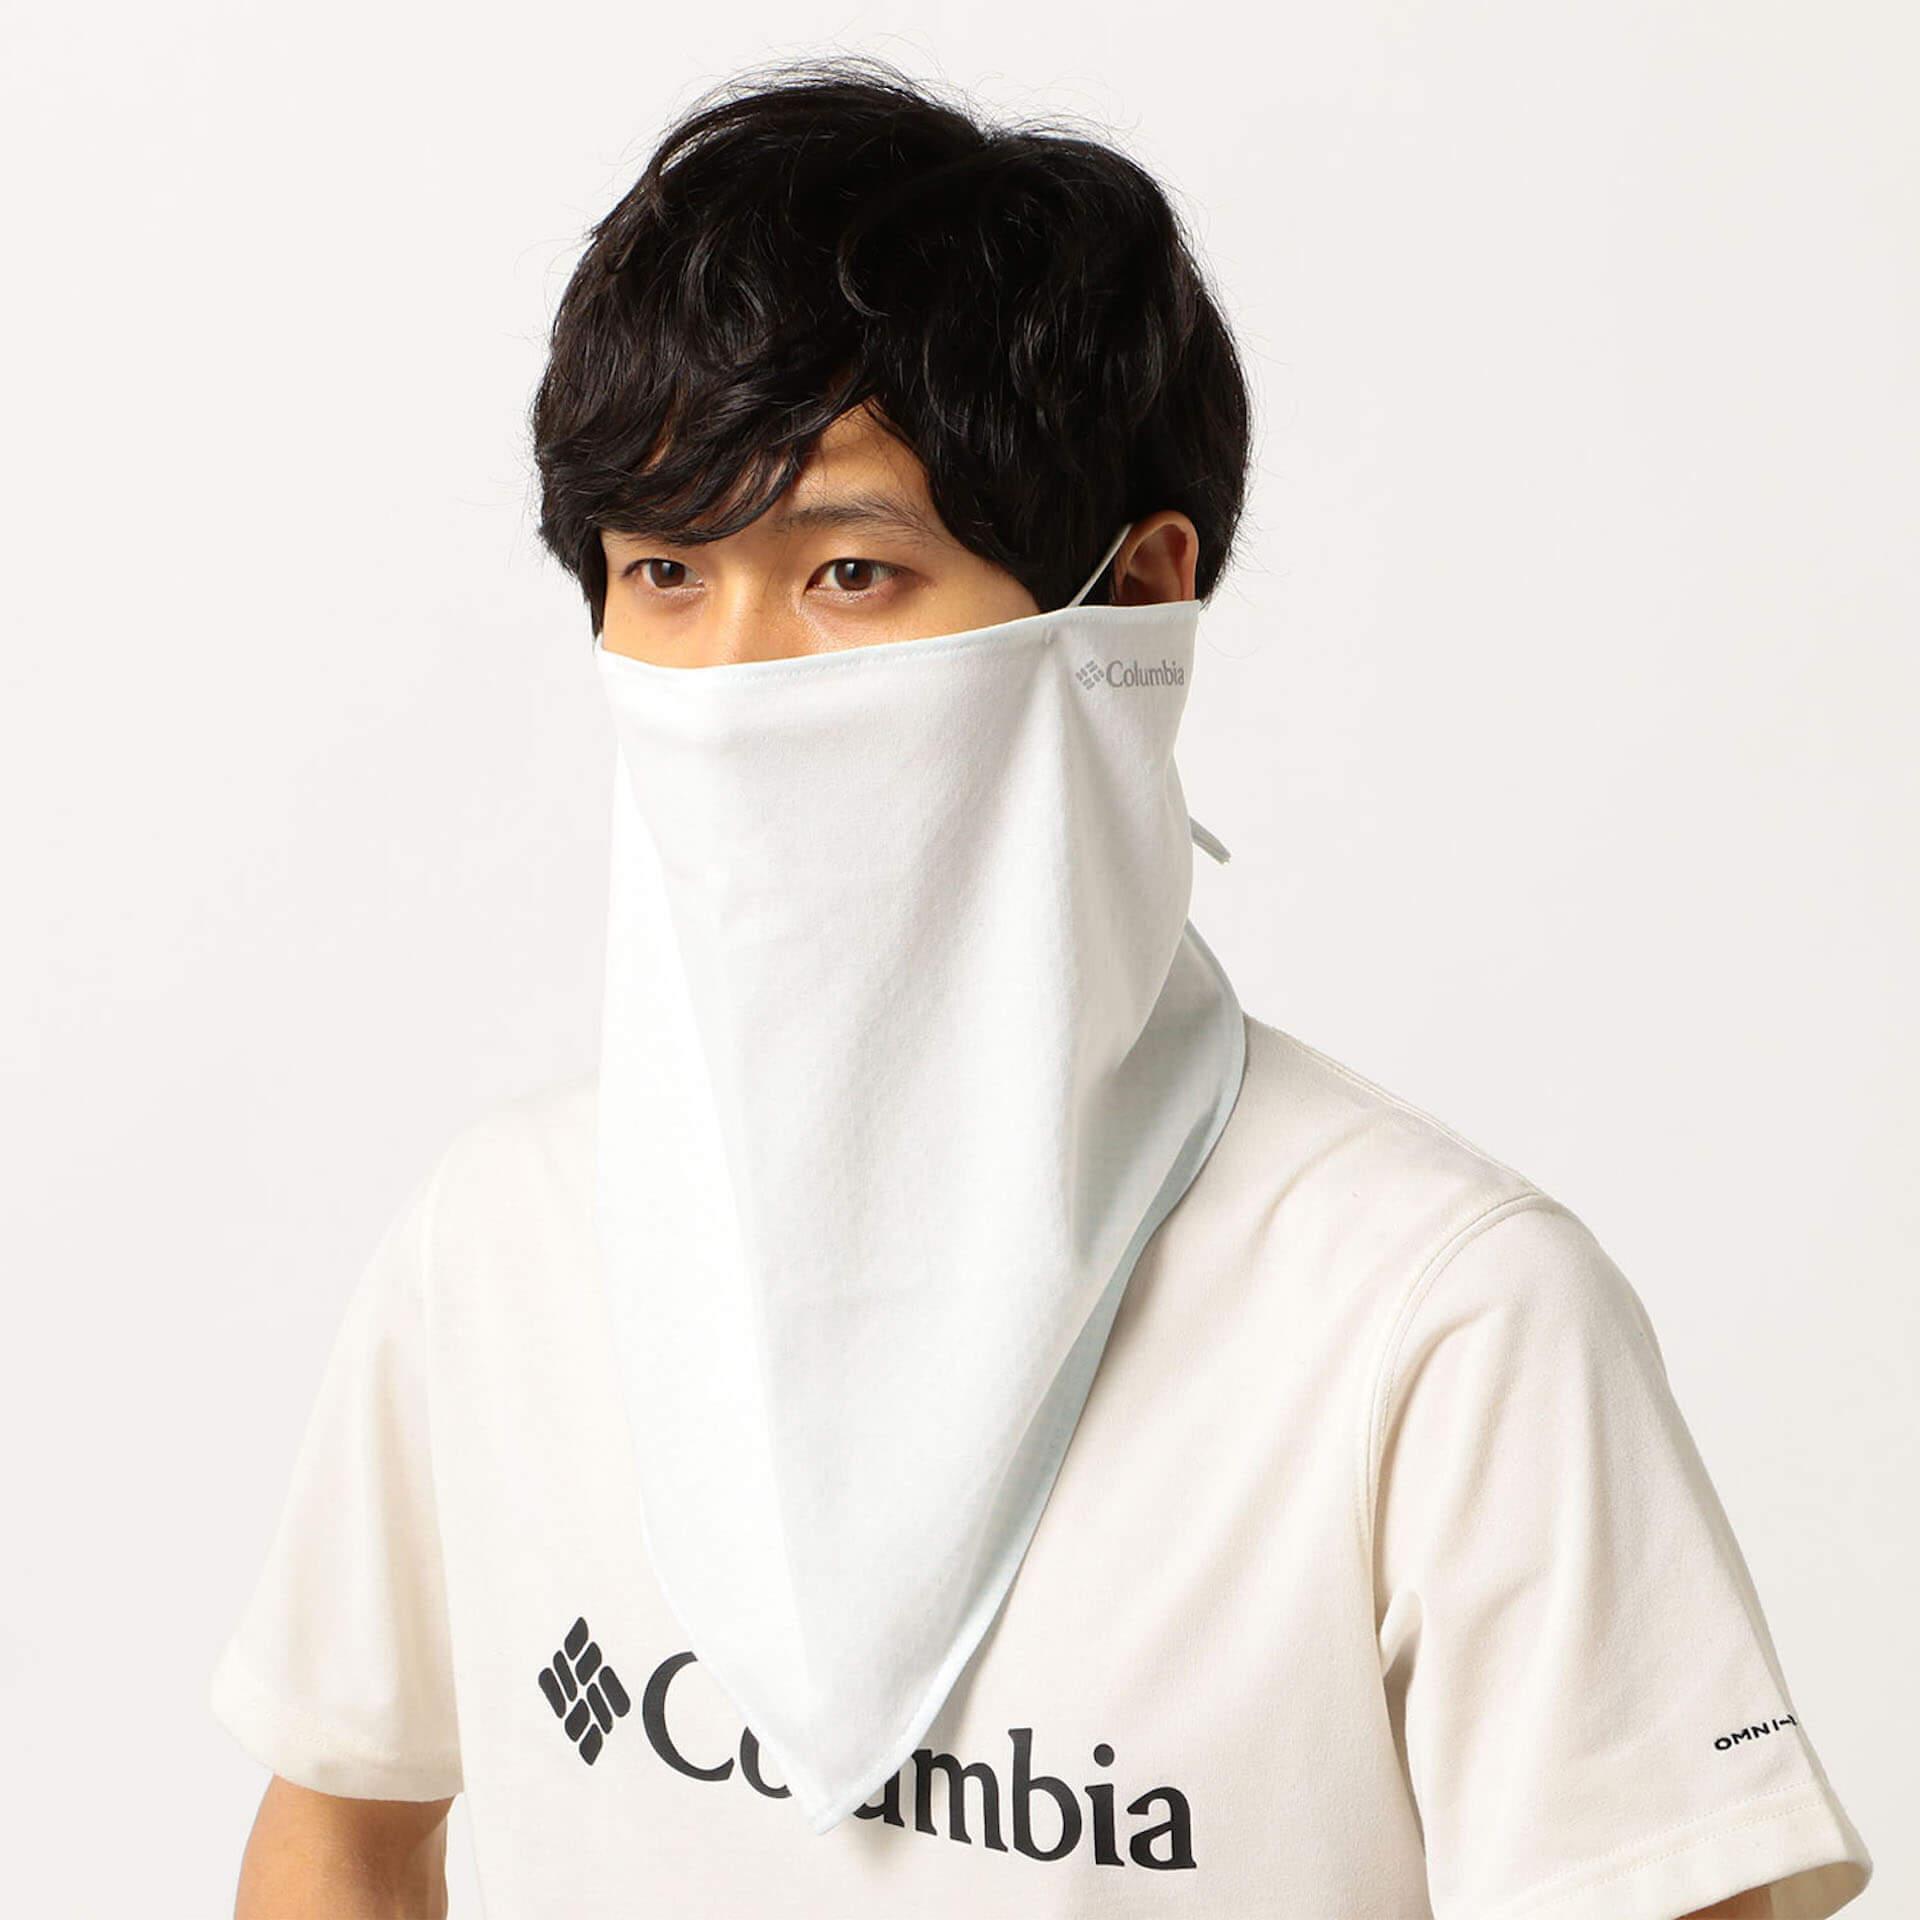 Columbiaからマスクがわりにも最適なネックガード2種が発売決定!汗が冷却効果をもたらす「オムニフリーズゼロ」搭載 life200721_columbia_mask_8